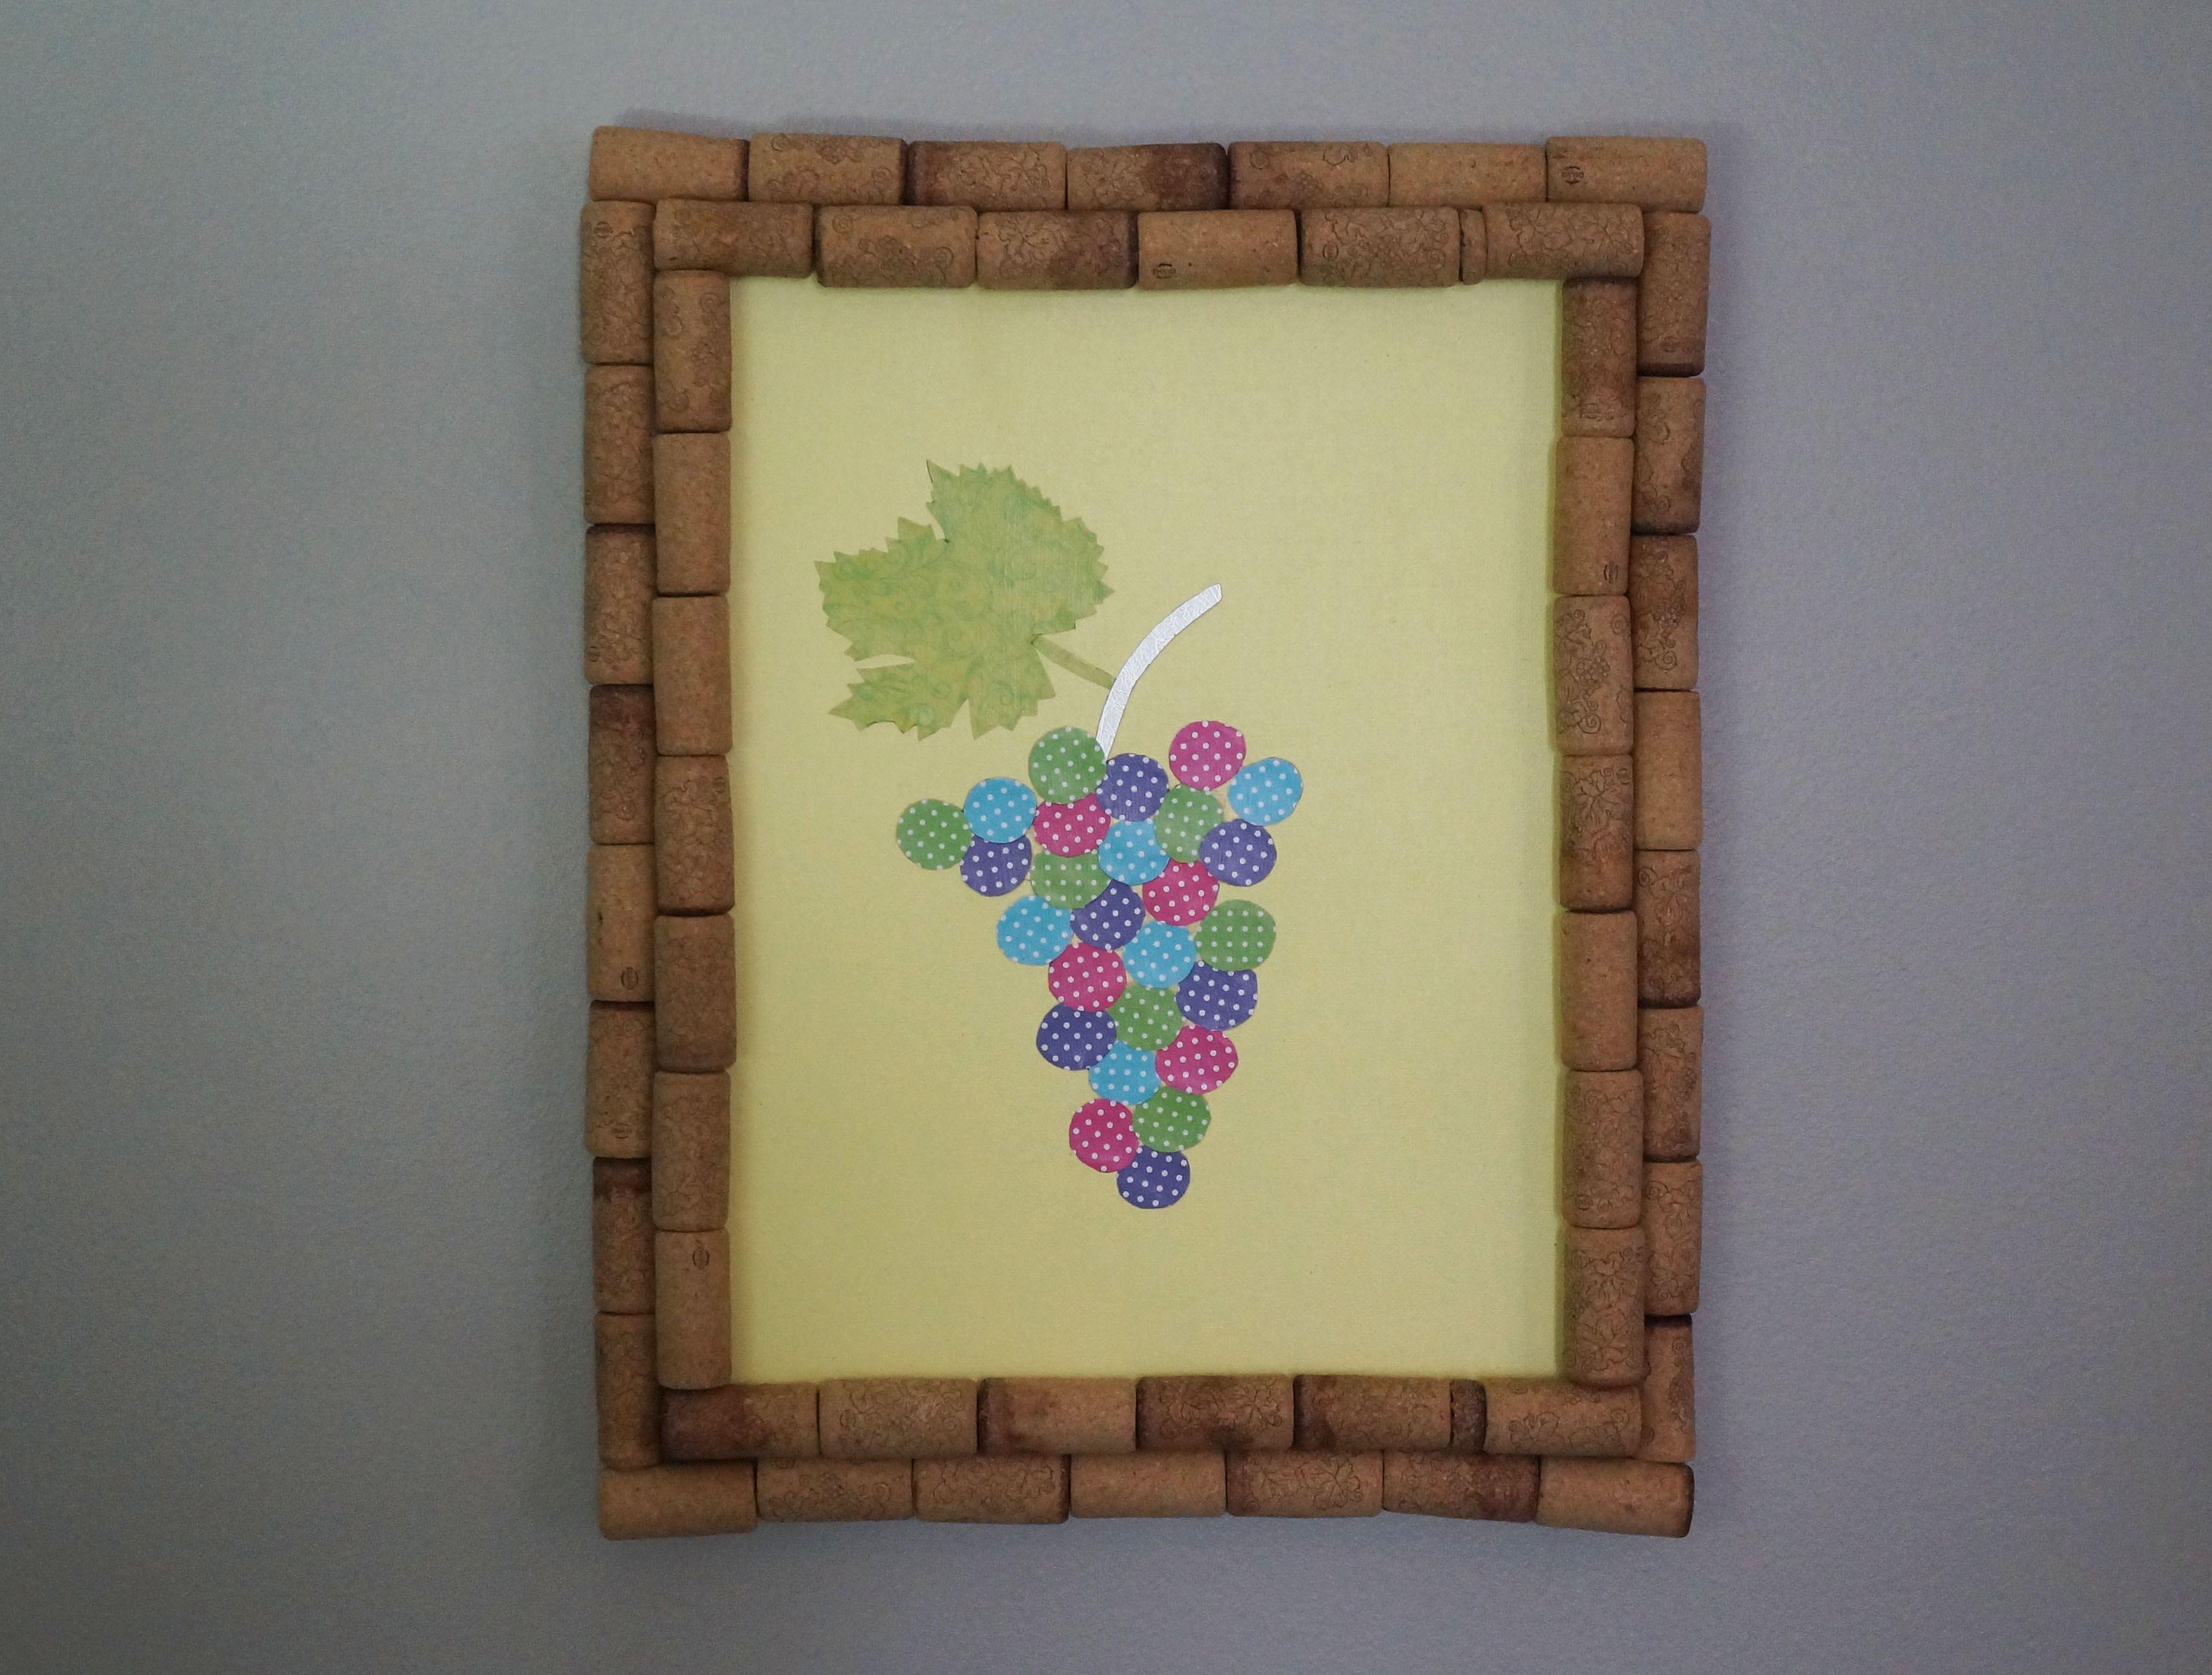 Dorable Wine Cork Wall Decor Motif - Wall Art Collections ...